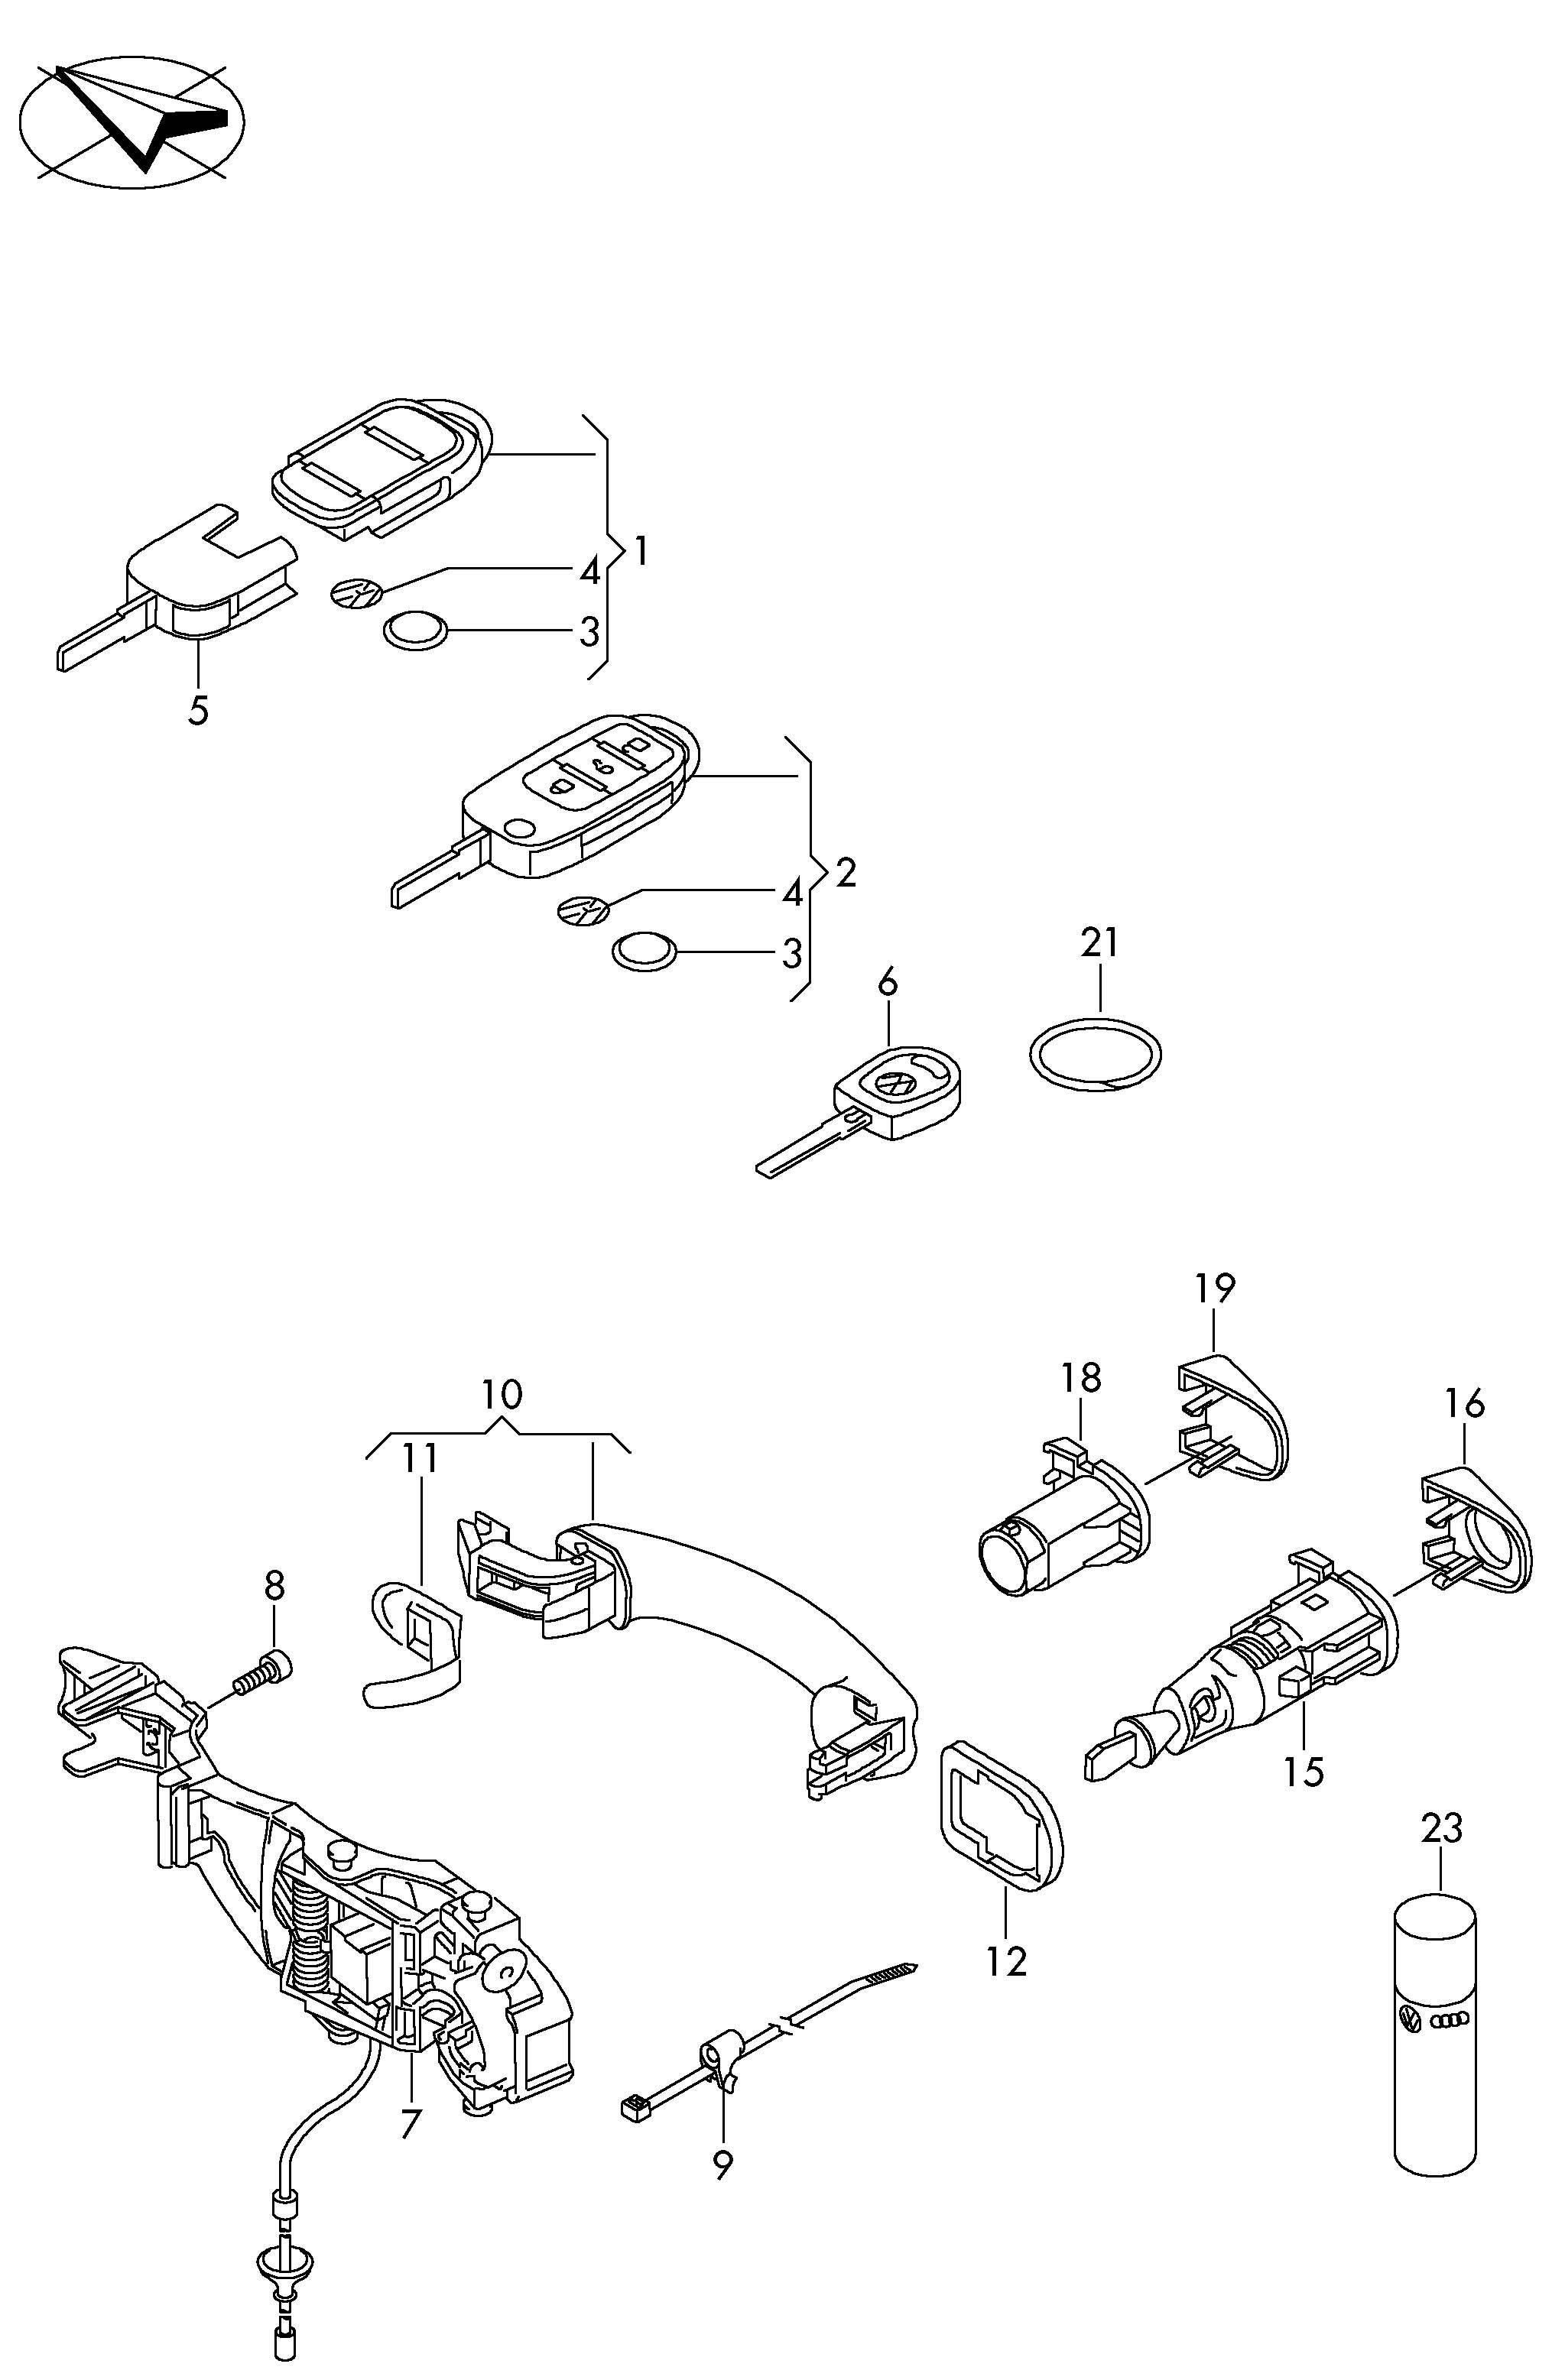 Vw Beetle Parts Catalog Wiring Diagram Auto. Diagram. Auto